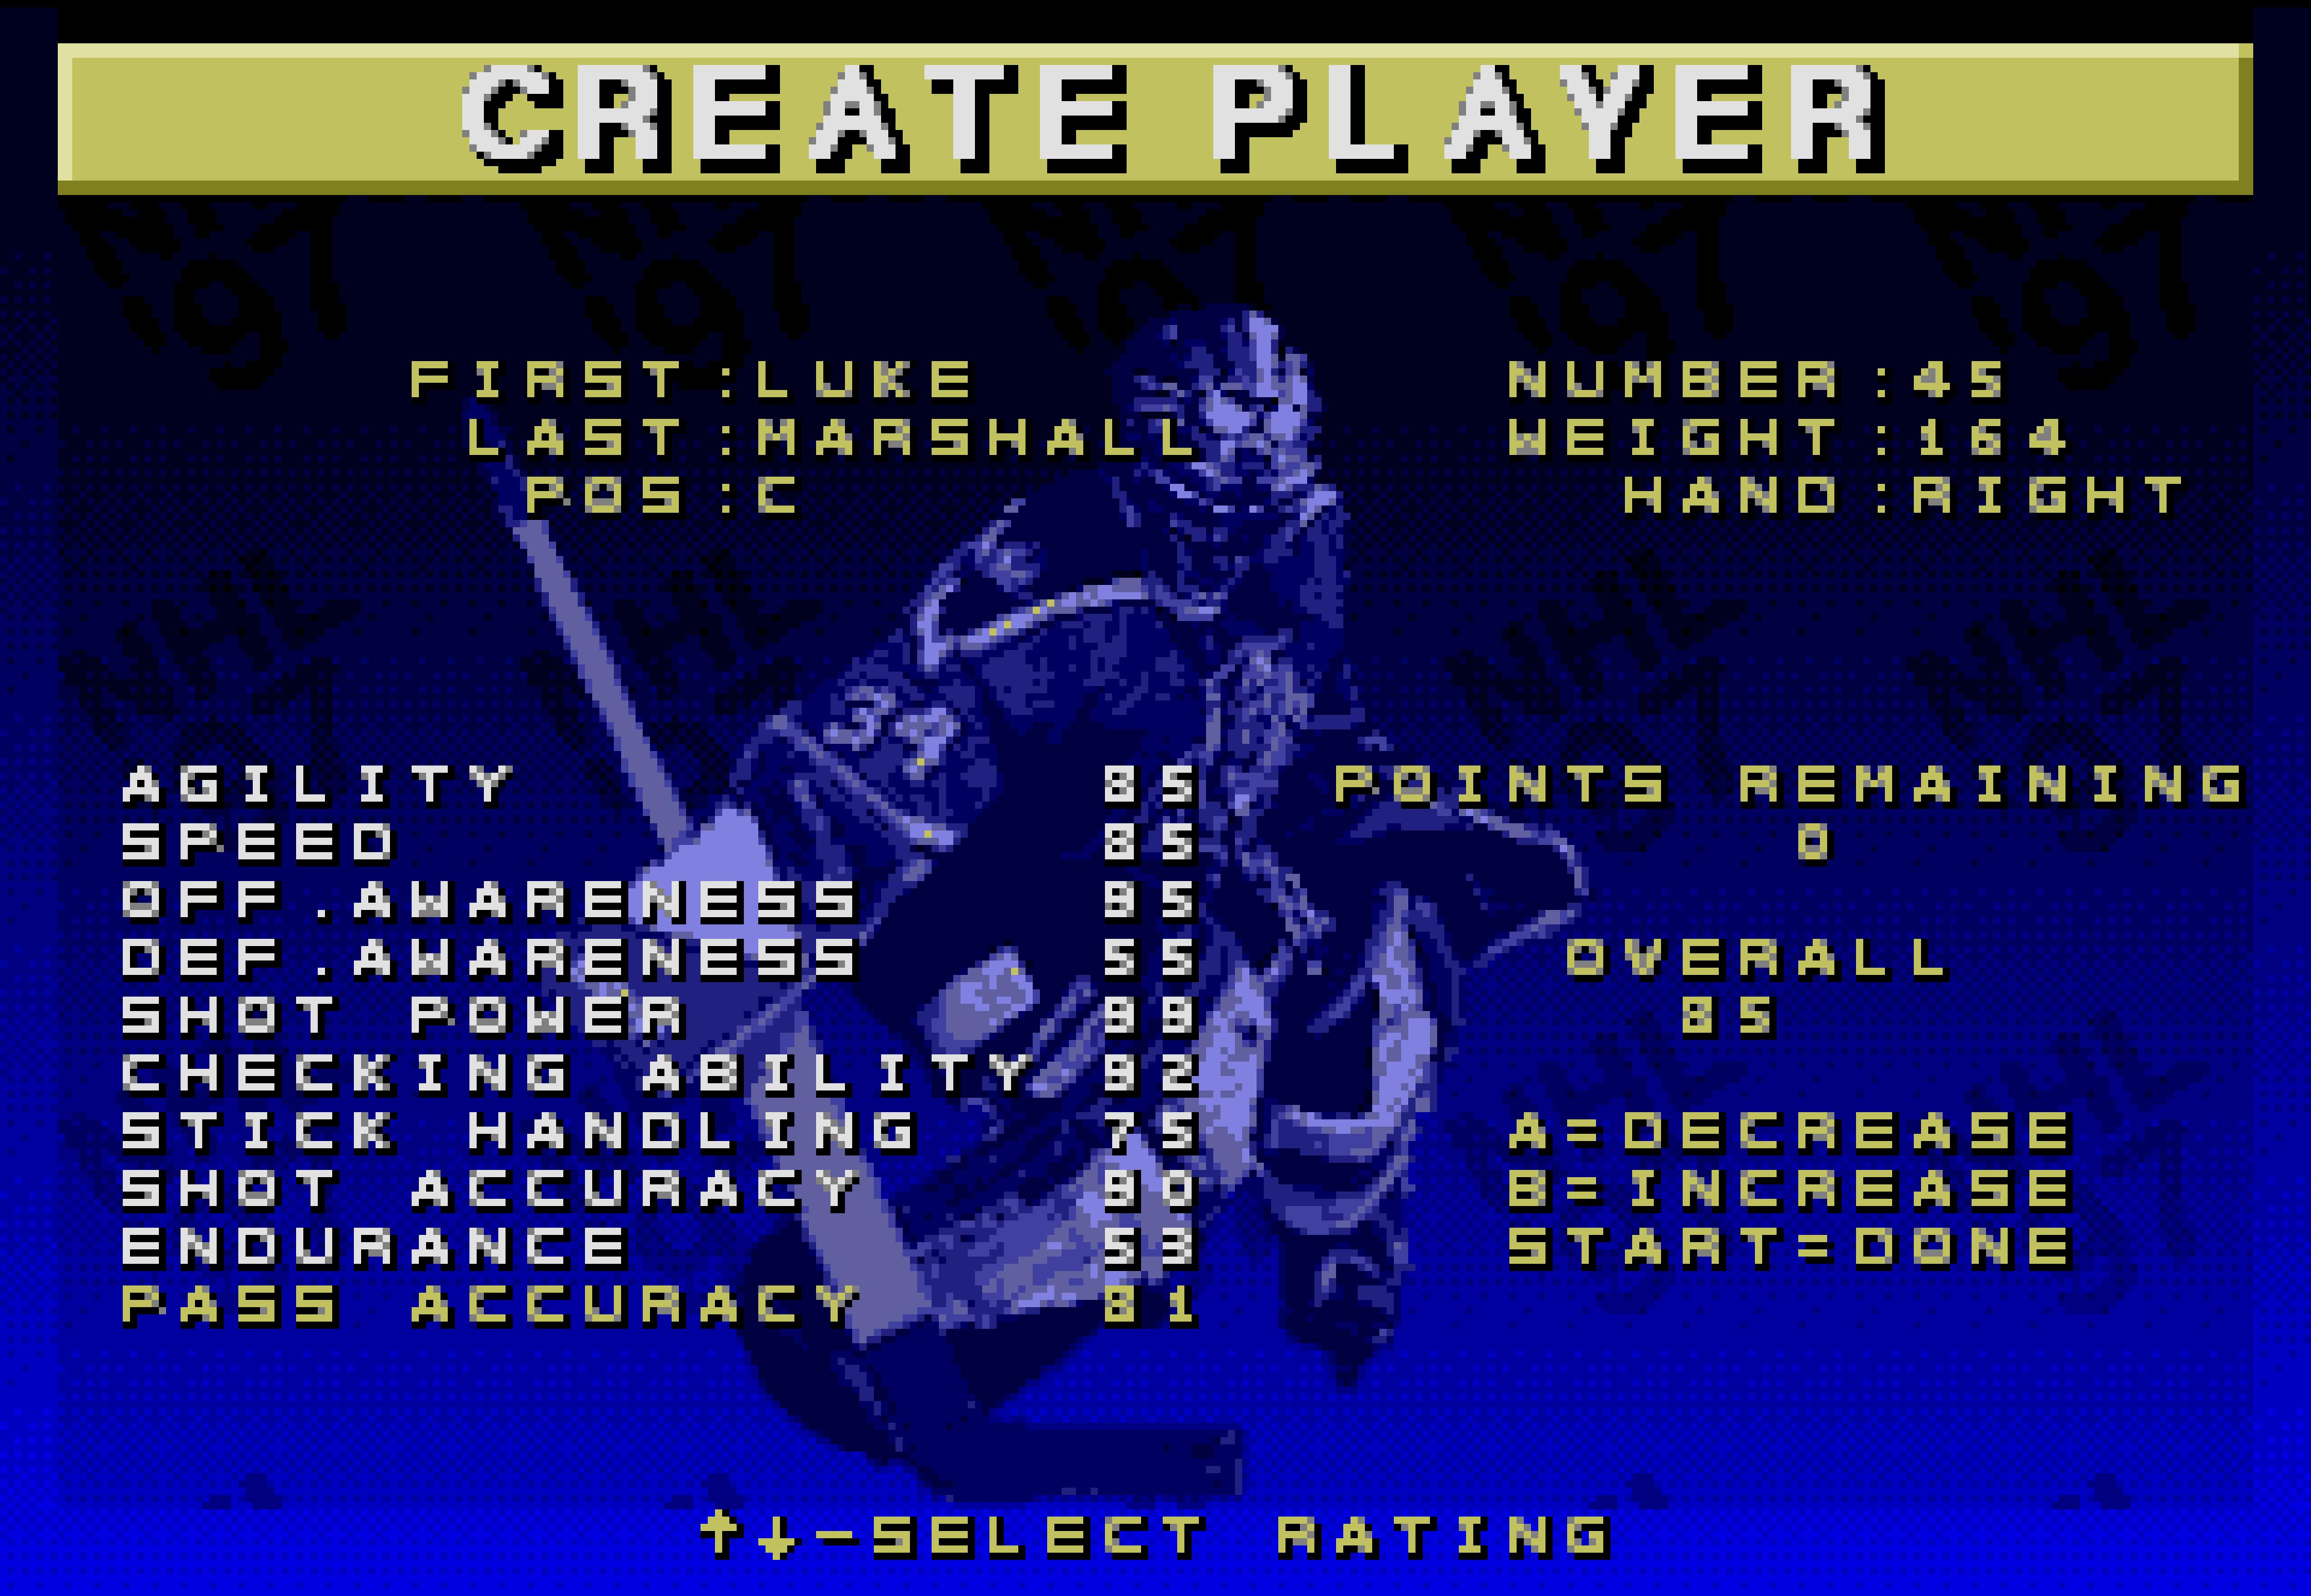 Luke Marshall in NHL 97